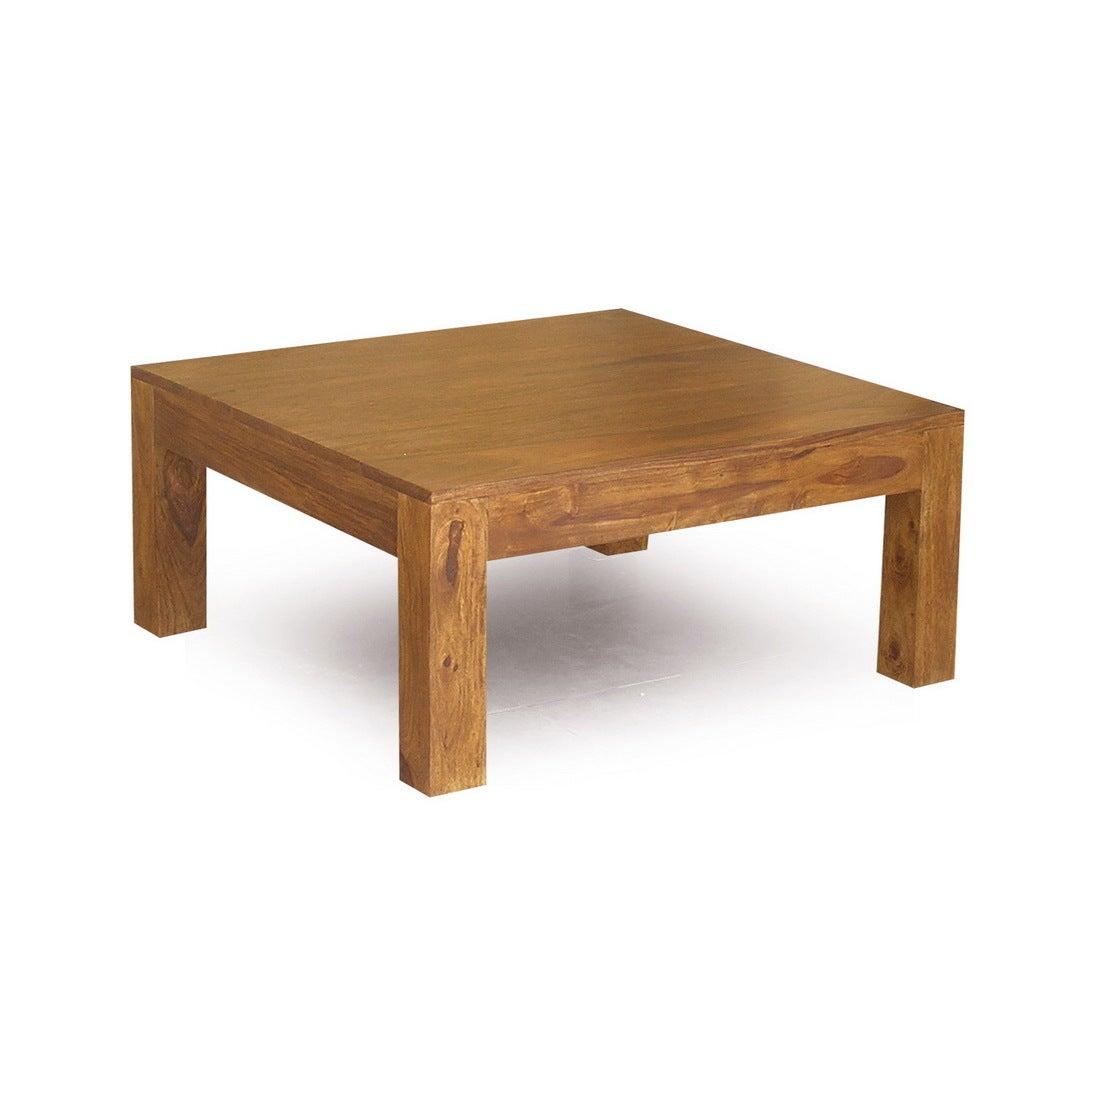 Prime Handmade Cube Low Square Table India Creativecarmelina Interior Chair Design Creativecarmelinacom